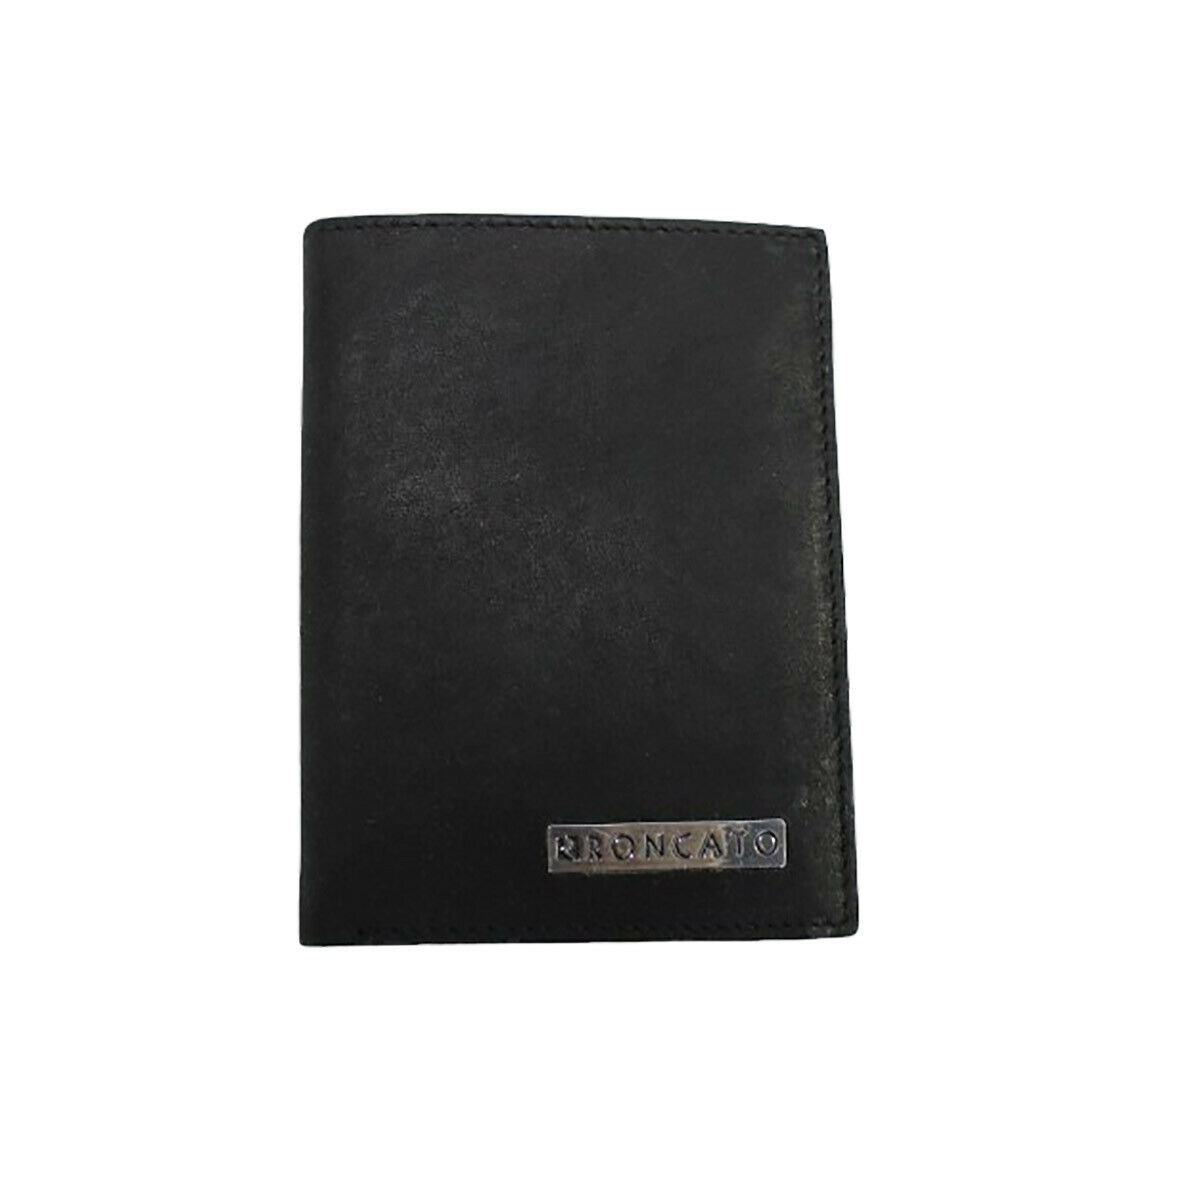 Men's Vertical Leather Wallet Credit Card Holder Photo Banknote R Roncato